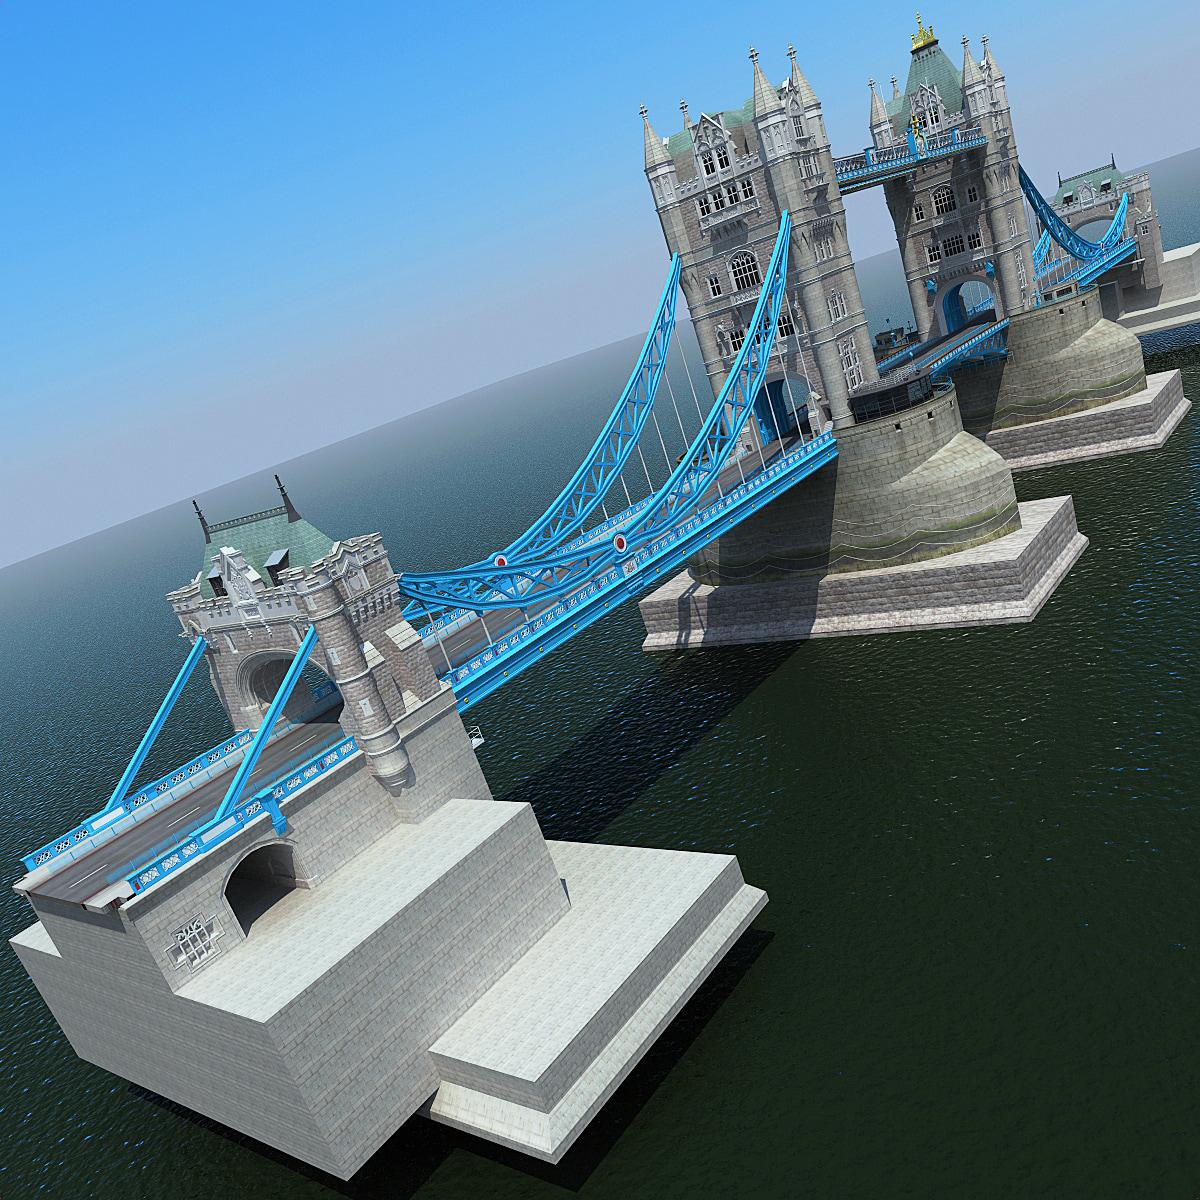 London_Tower_Bridge_V2_001.jpg